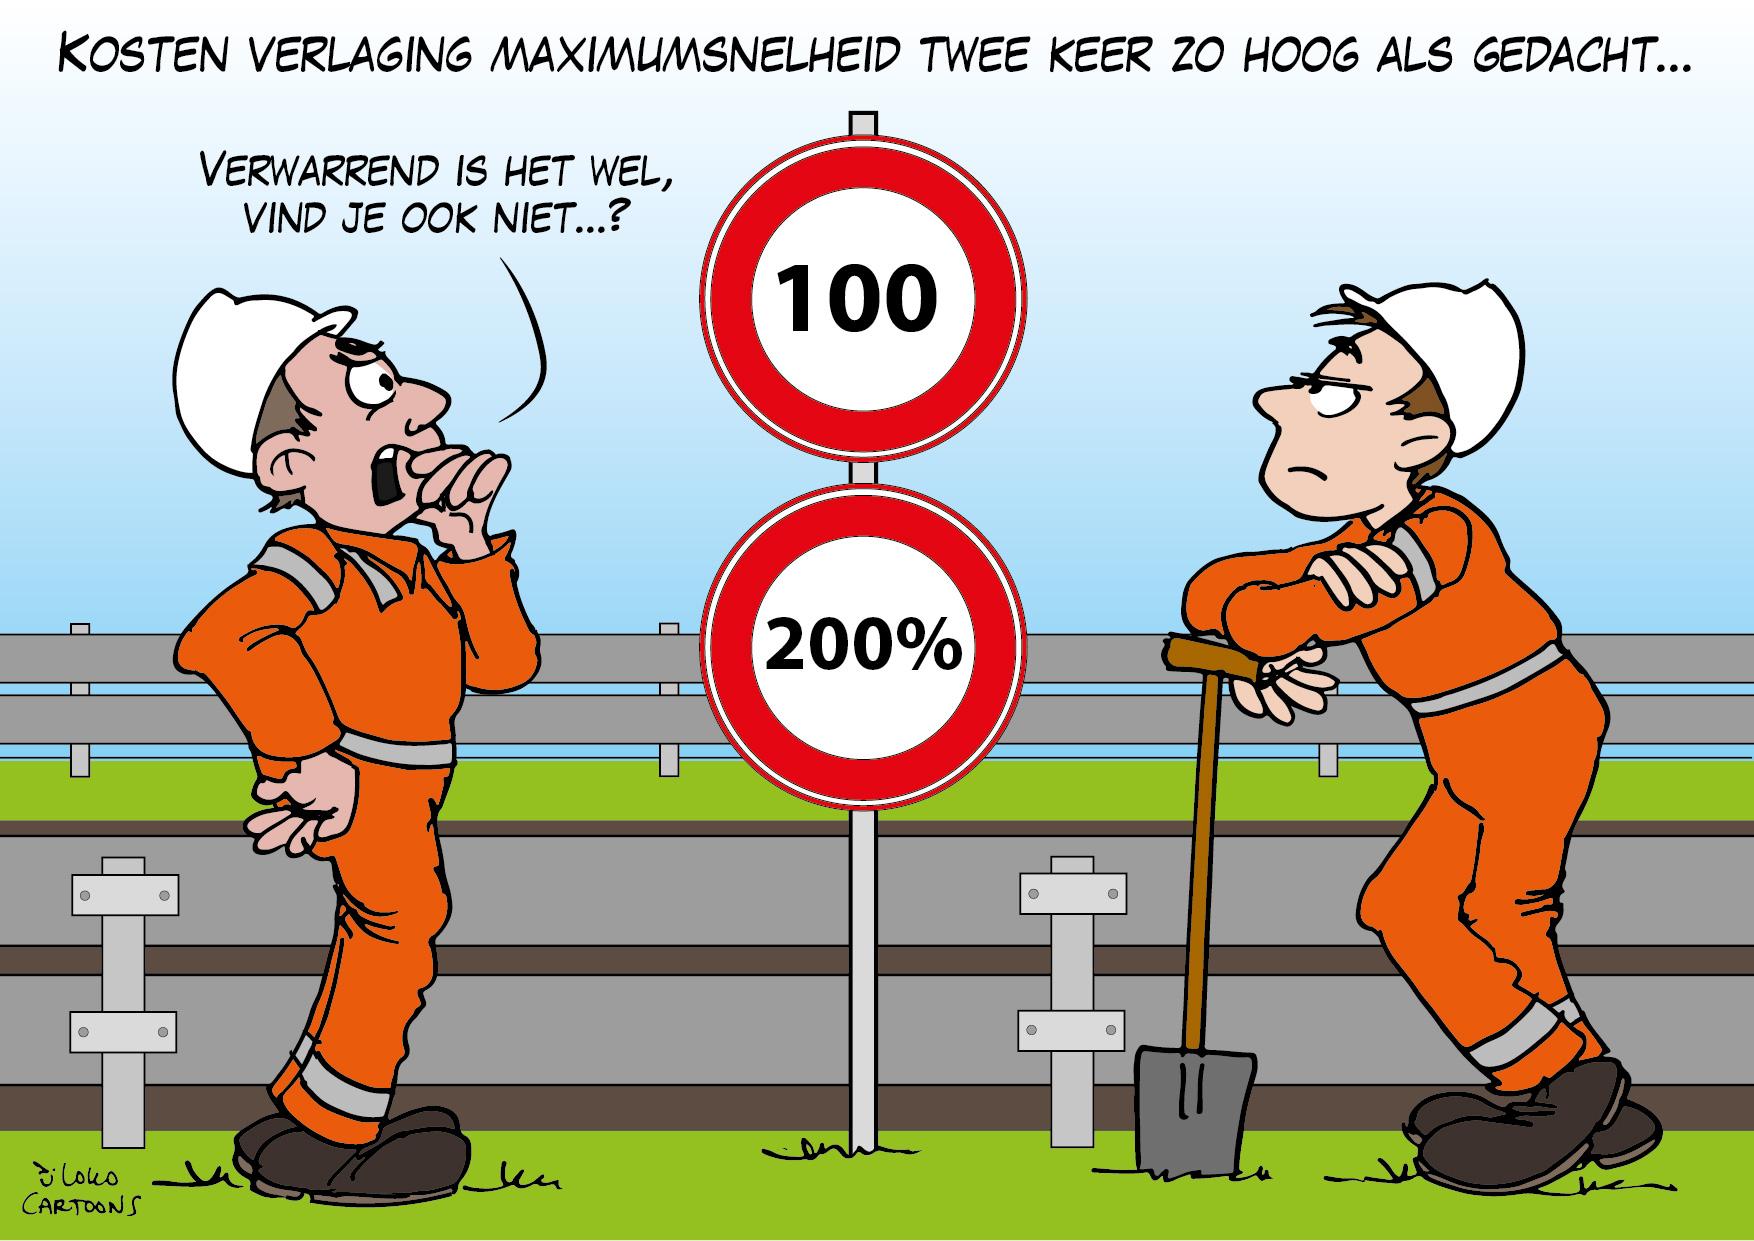 Kosten verlaging maximumsnelheid twee keer zo hoog als gedacht…